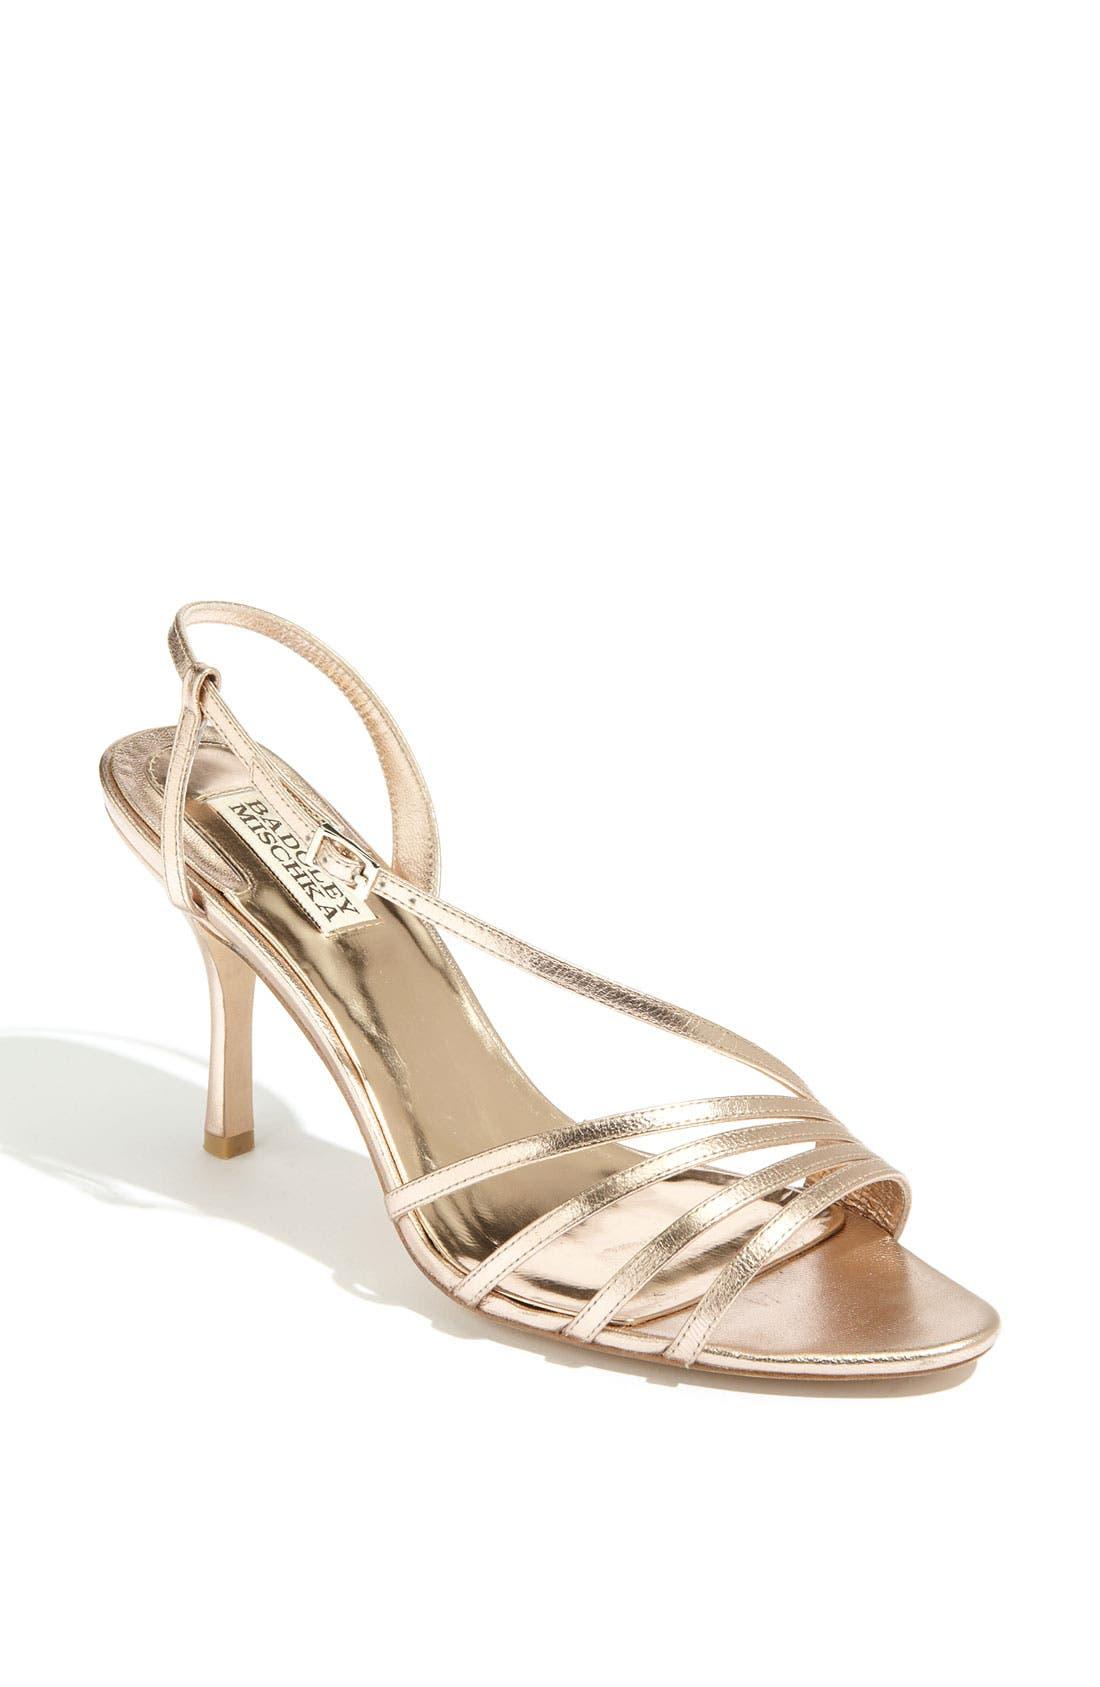 Main Image - Badgley Mischka 'Guinevere' Sandal